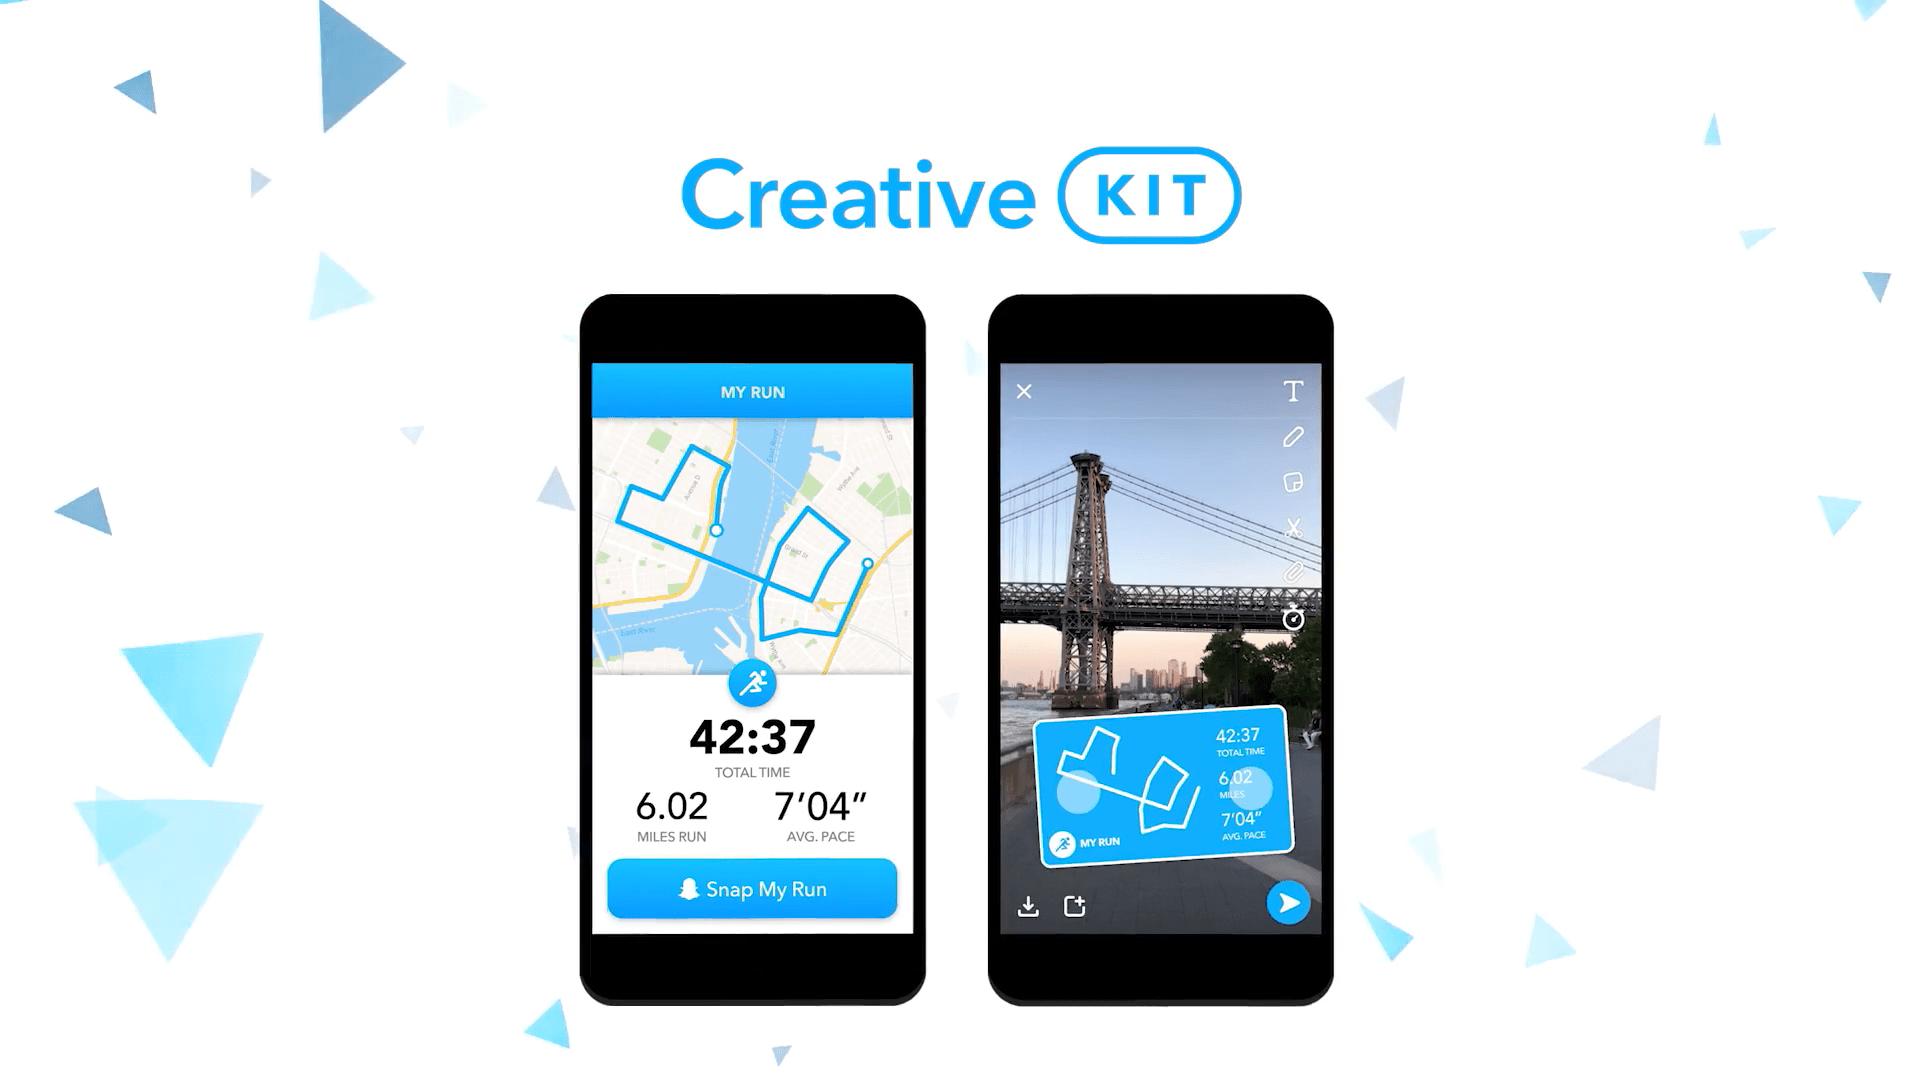 Creative Kit Snapchat